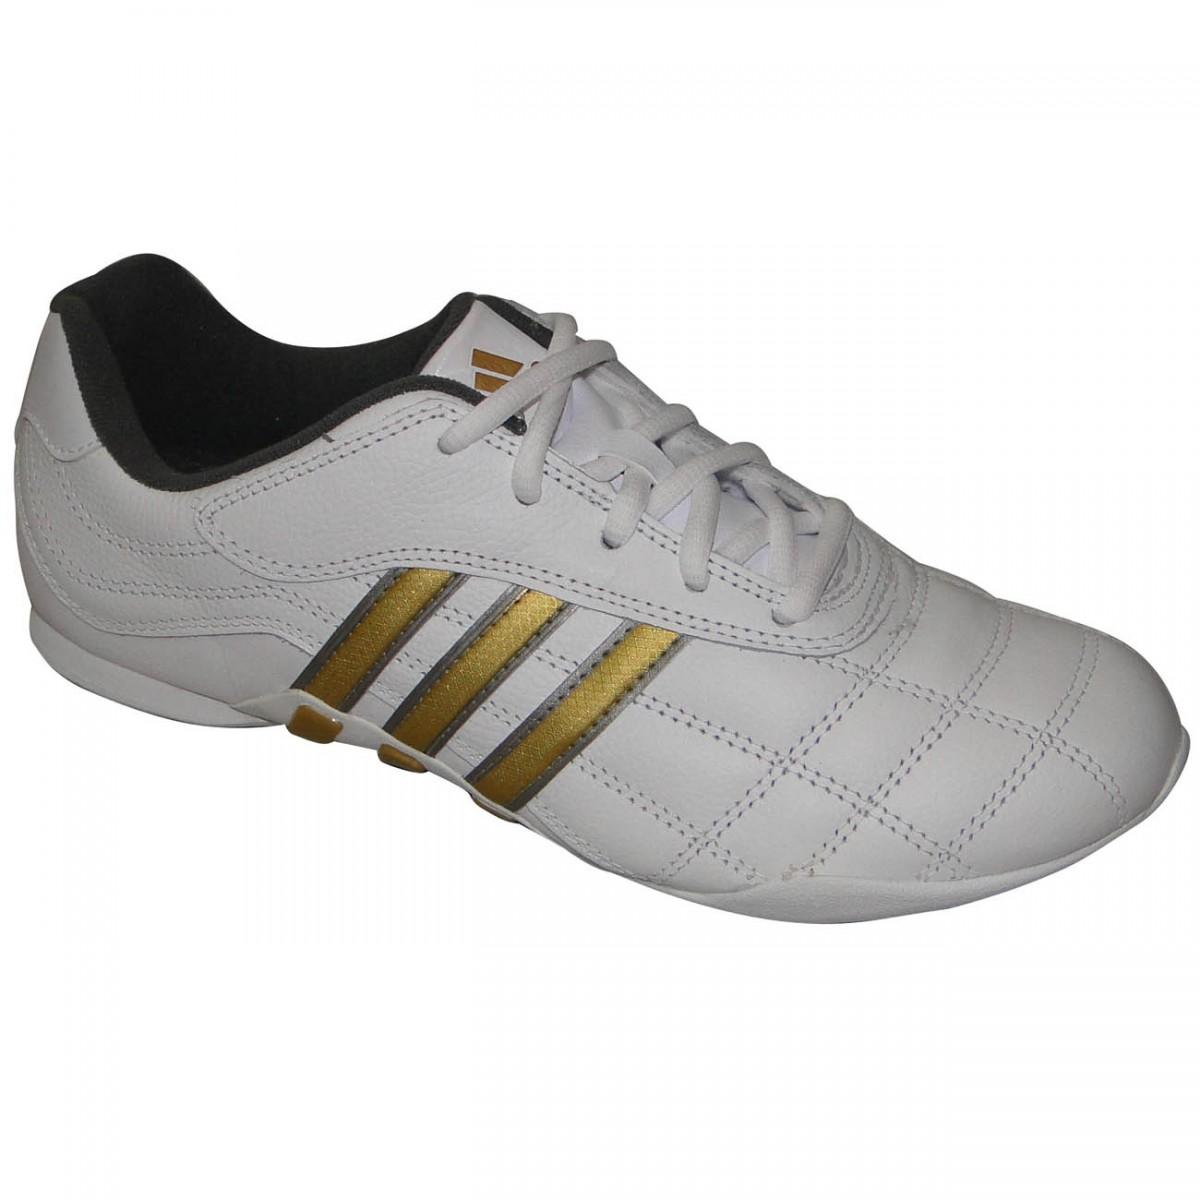 040ba30aa2b Tênis Adidas Kundo Ii G29203 - BRANCO DOURADO - Chuteira Nike ...